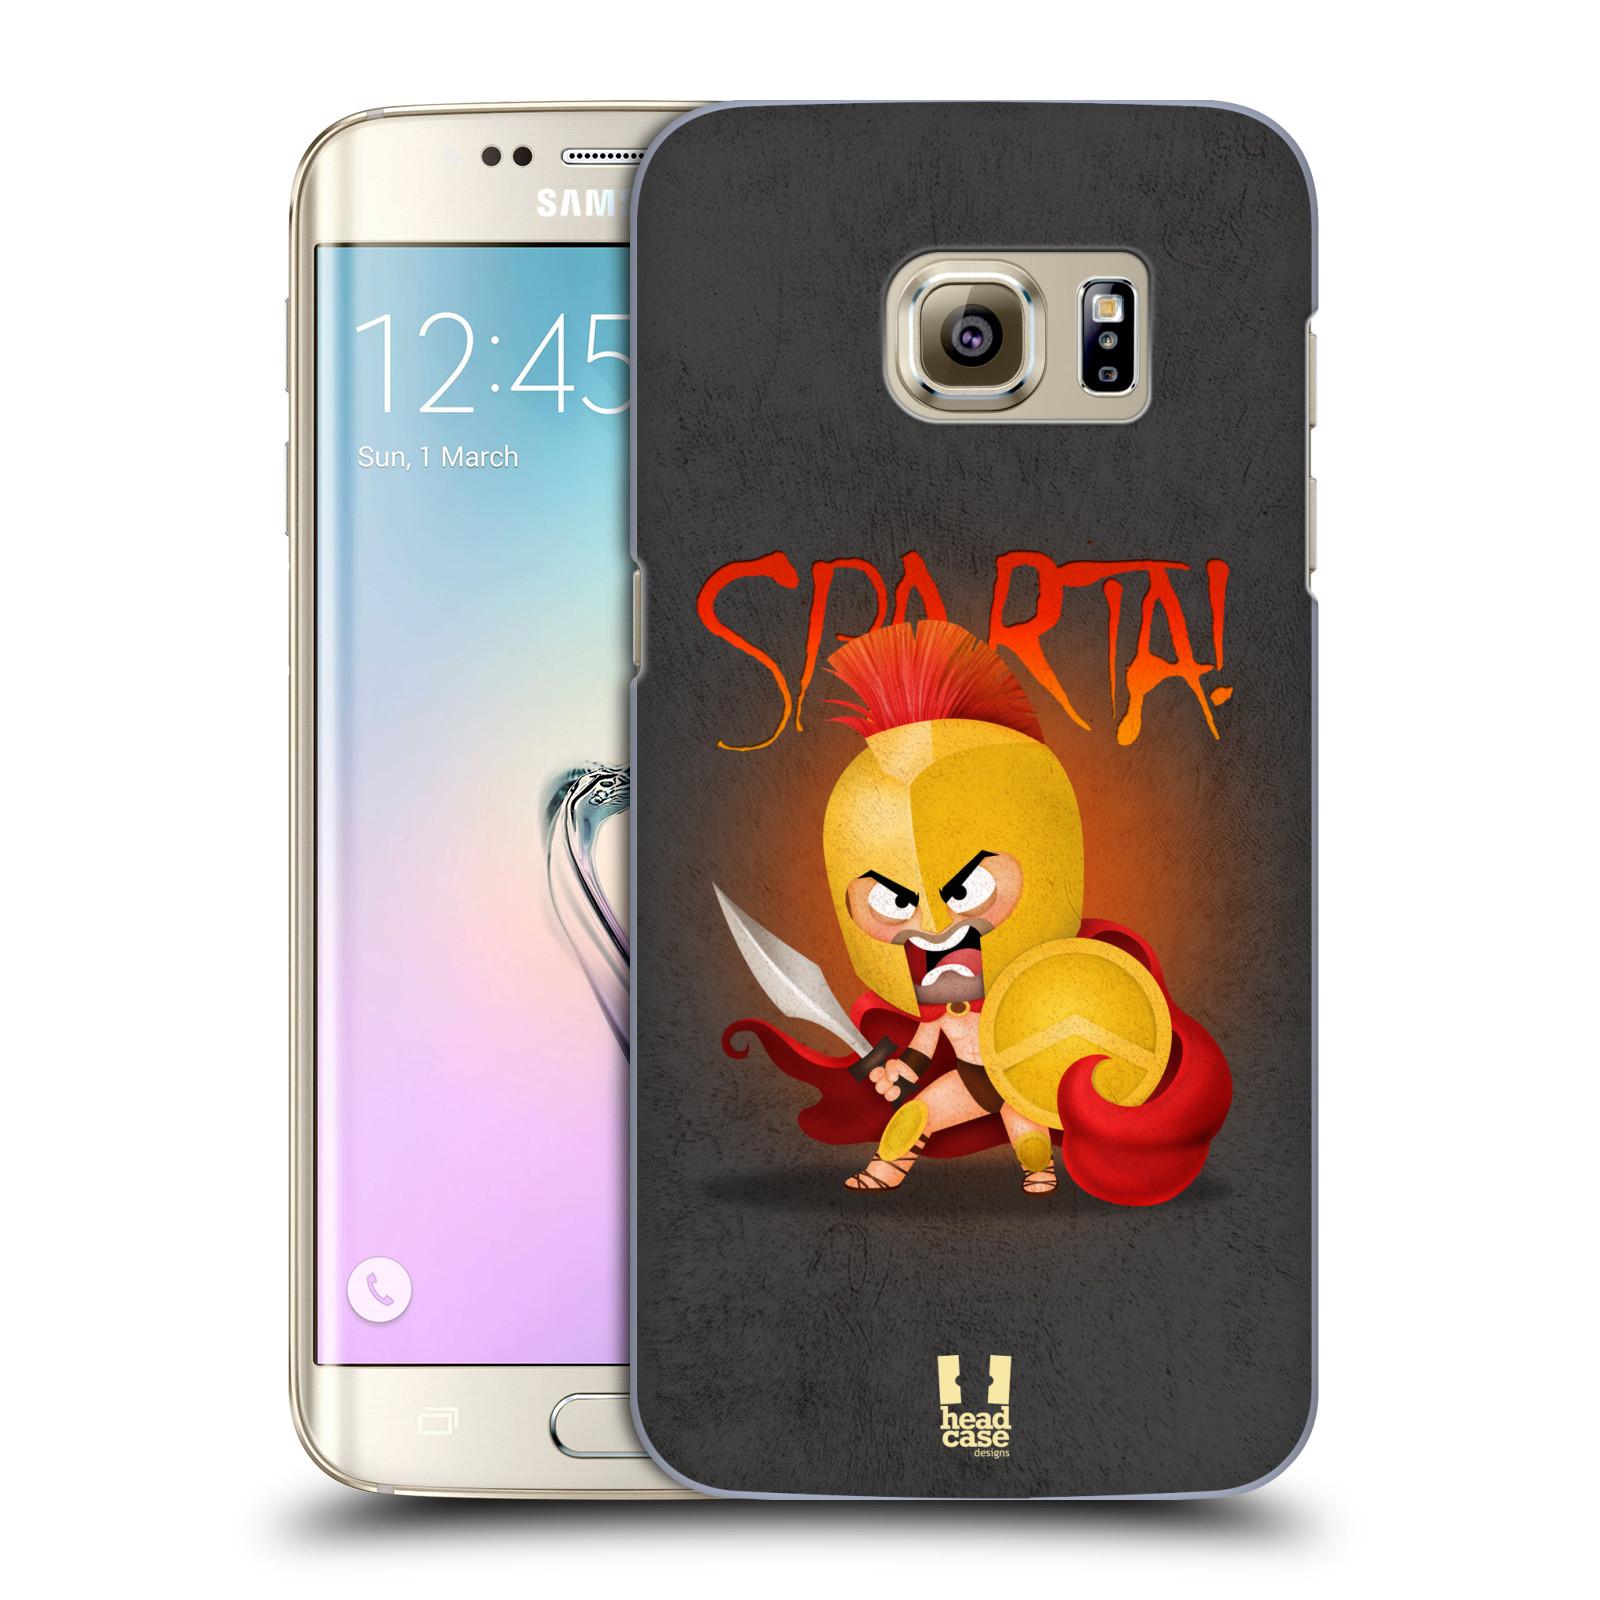 Plastové pouzdro na mobil Samsung Galaxy S7 Edge HEAD CASE Sparta (Kryt či obal na mobilní telefon Samsung Galaxy S7 Edge SM-G935F)